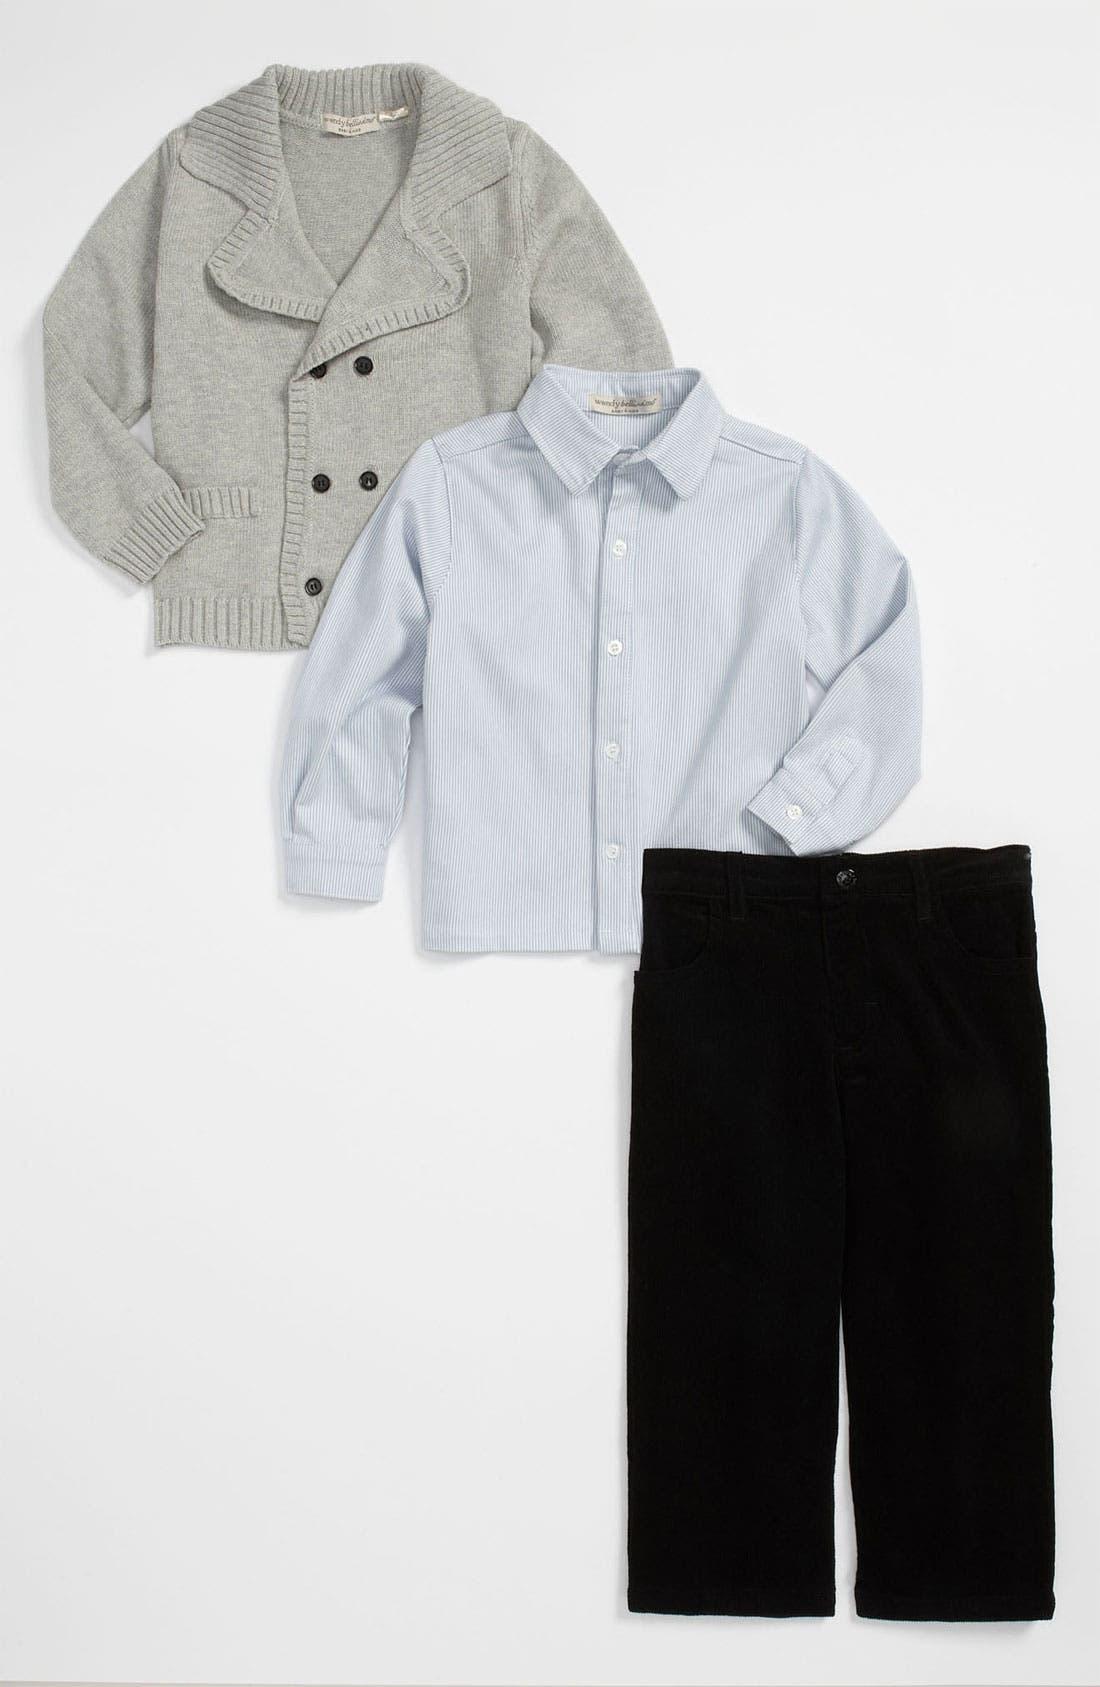 Alternate Image 1 Selected - Wendy Bellissimo Cardigan, Shirt & Pants Set (Infant)